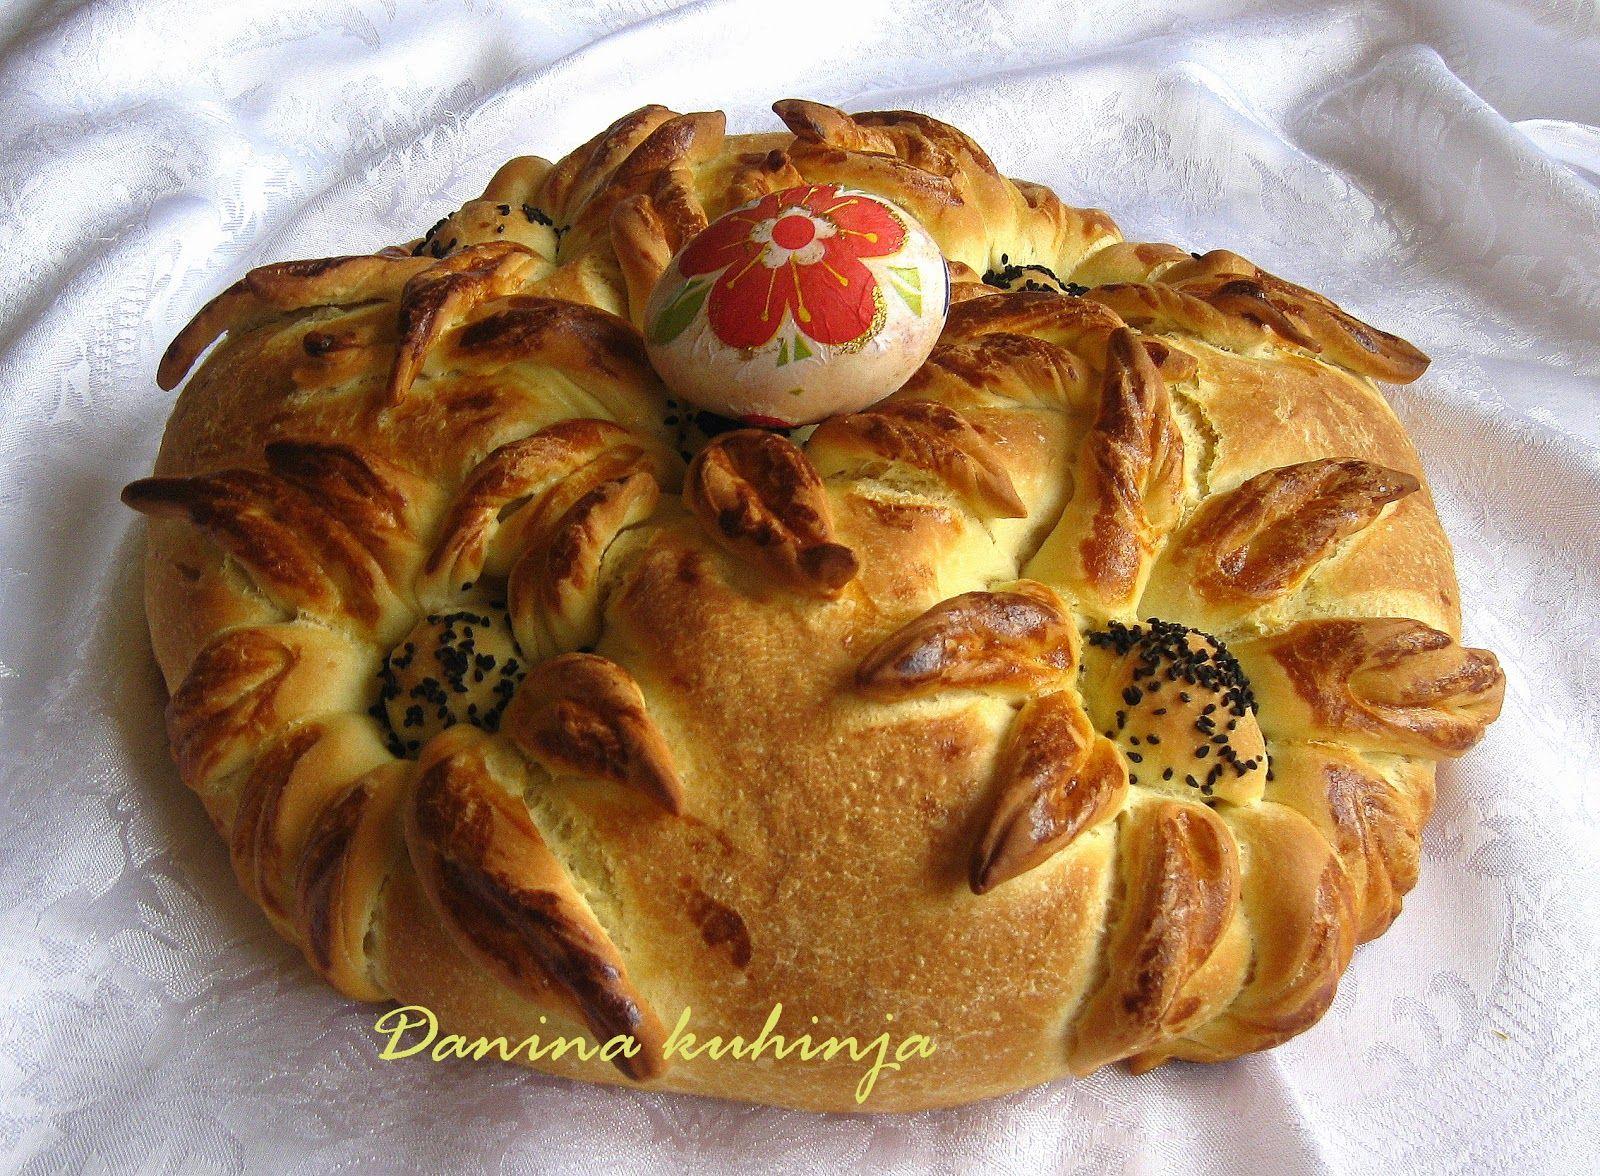 Danina kuhinja: Pogače